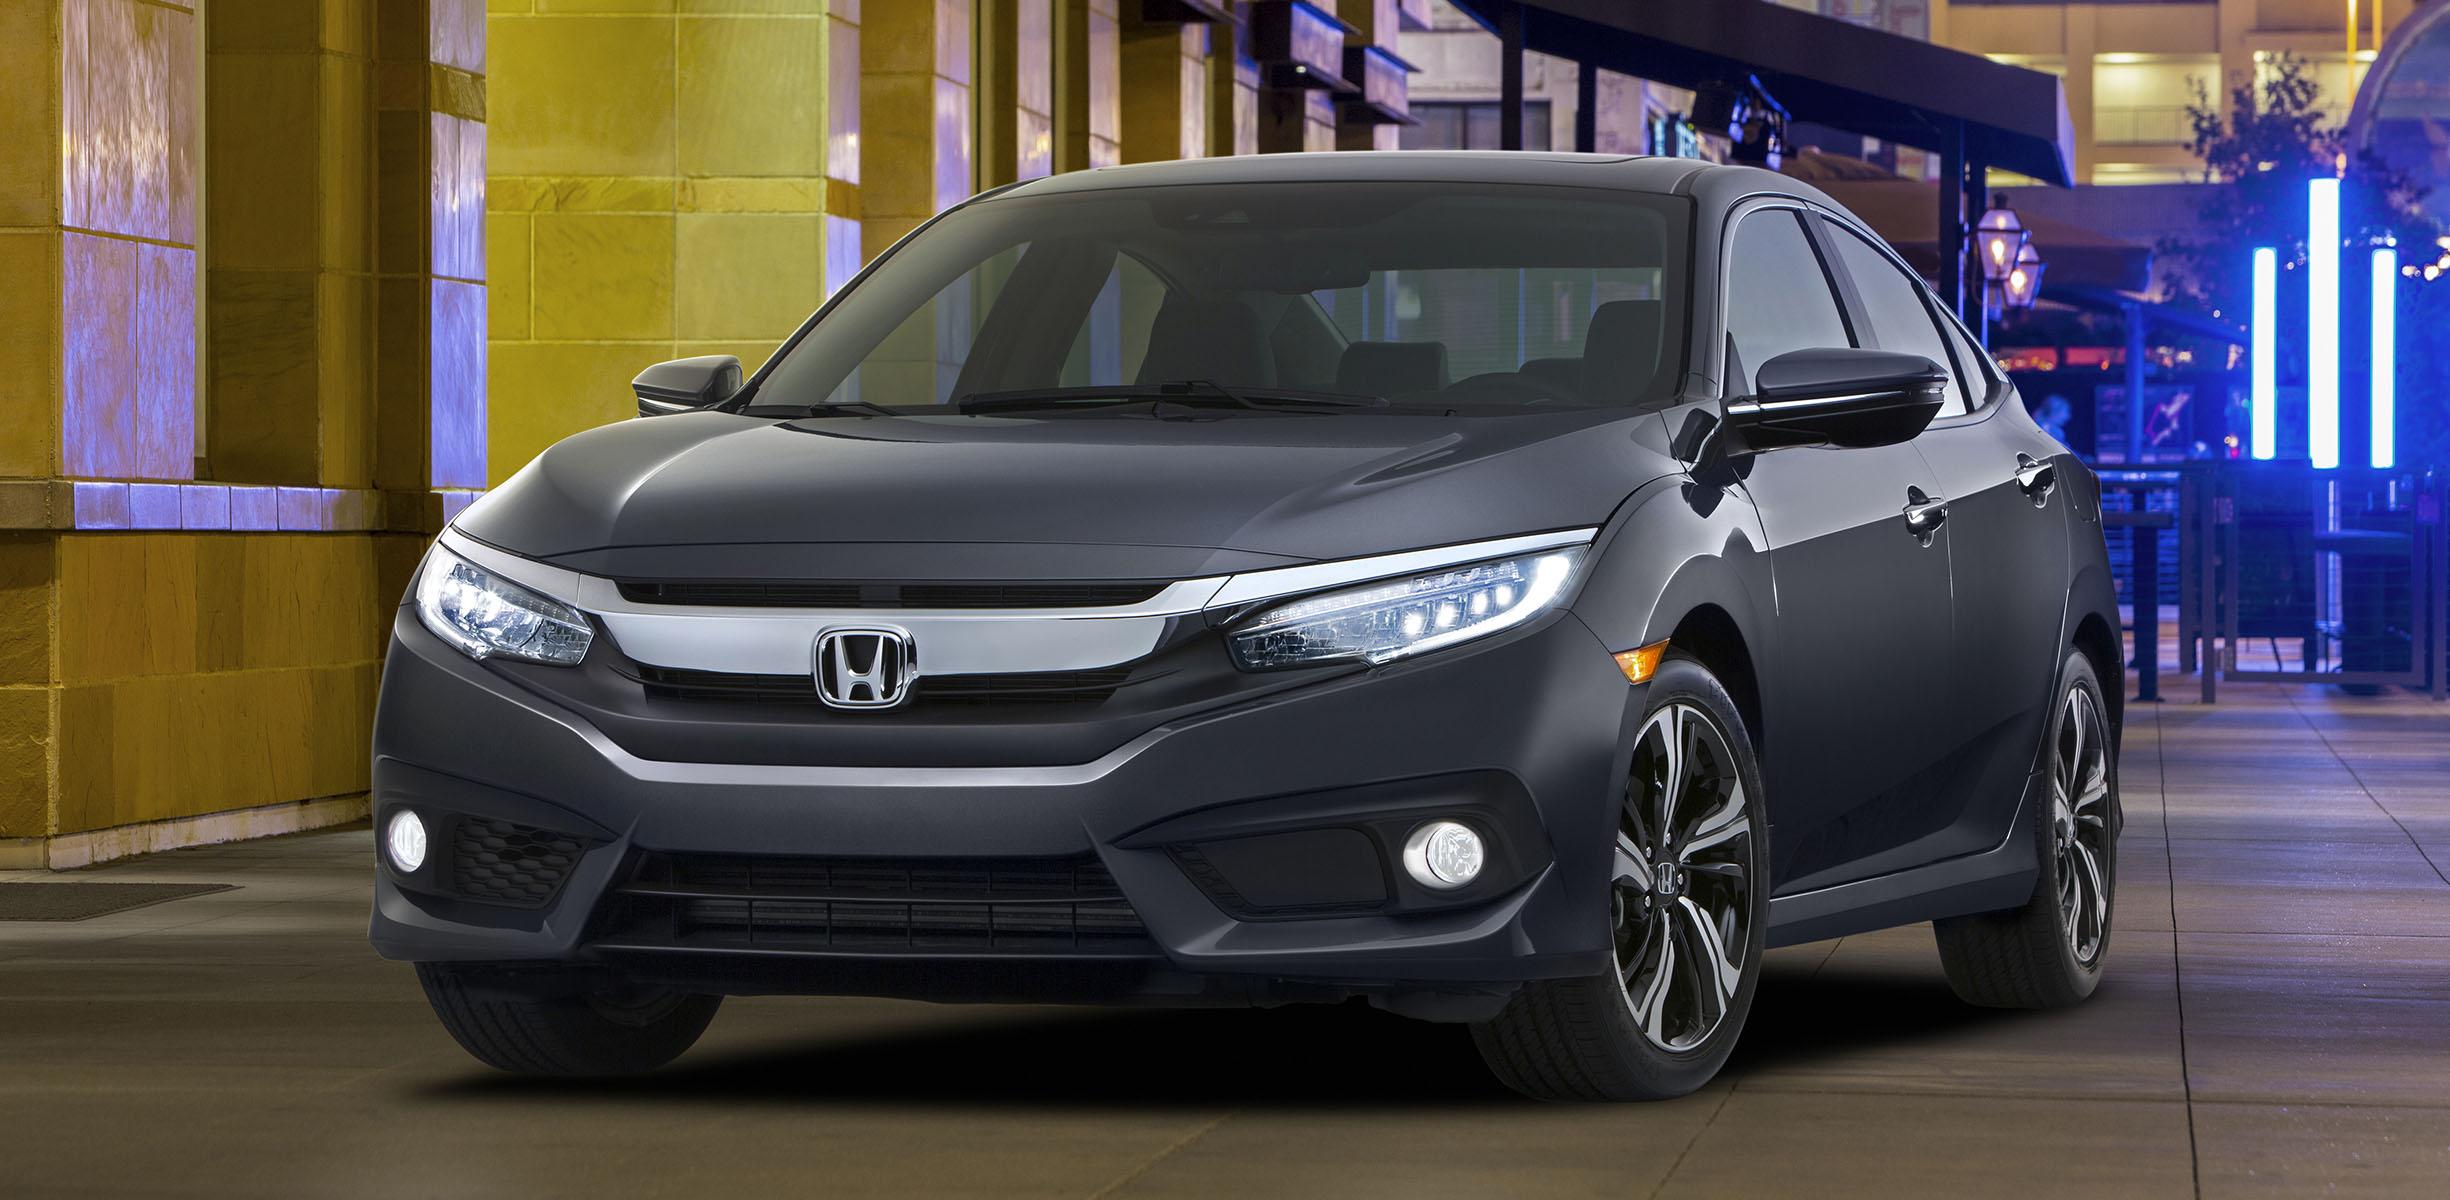 Lovely 2016 Honda Civic Sedan Unveiled Nice Look